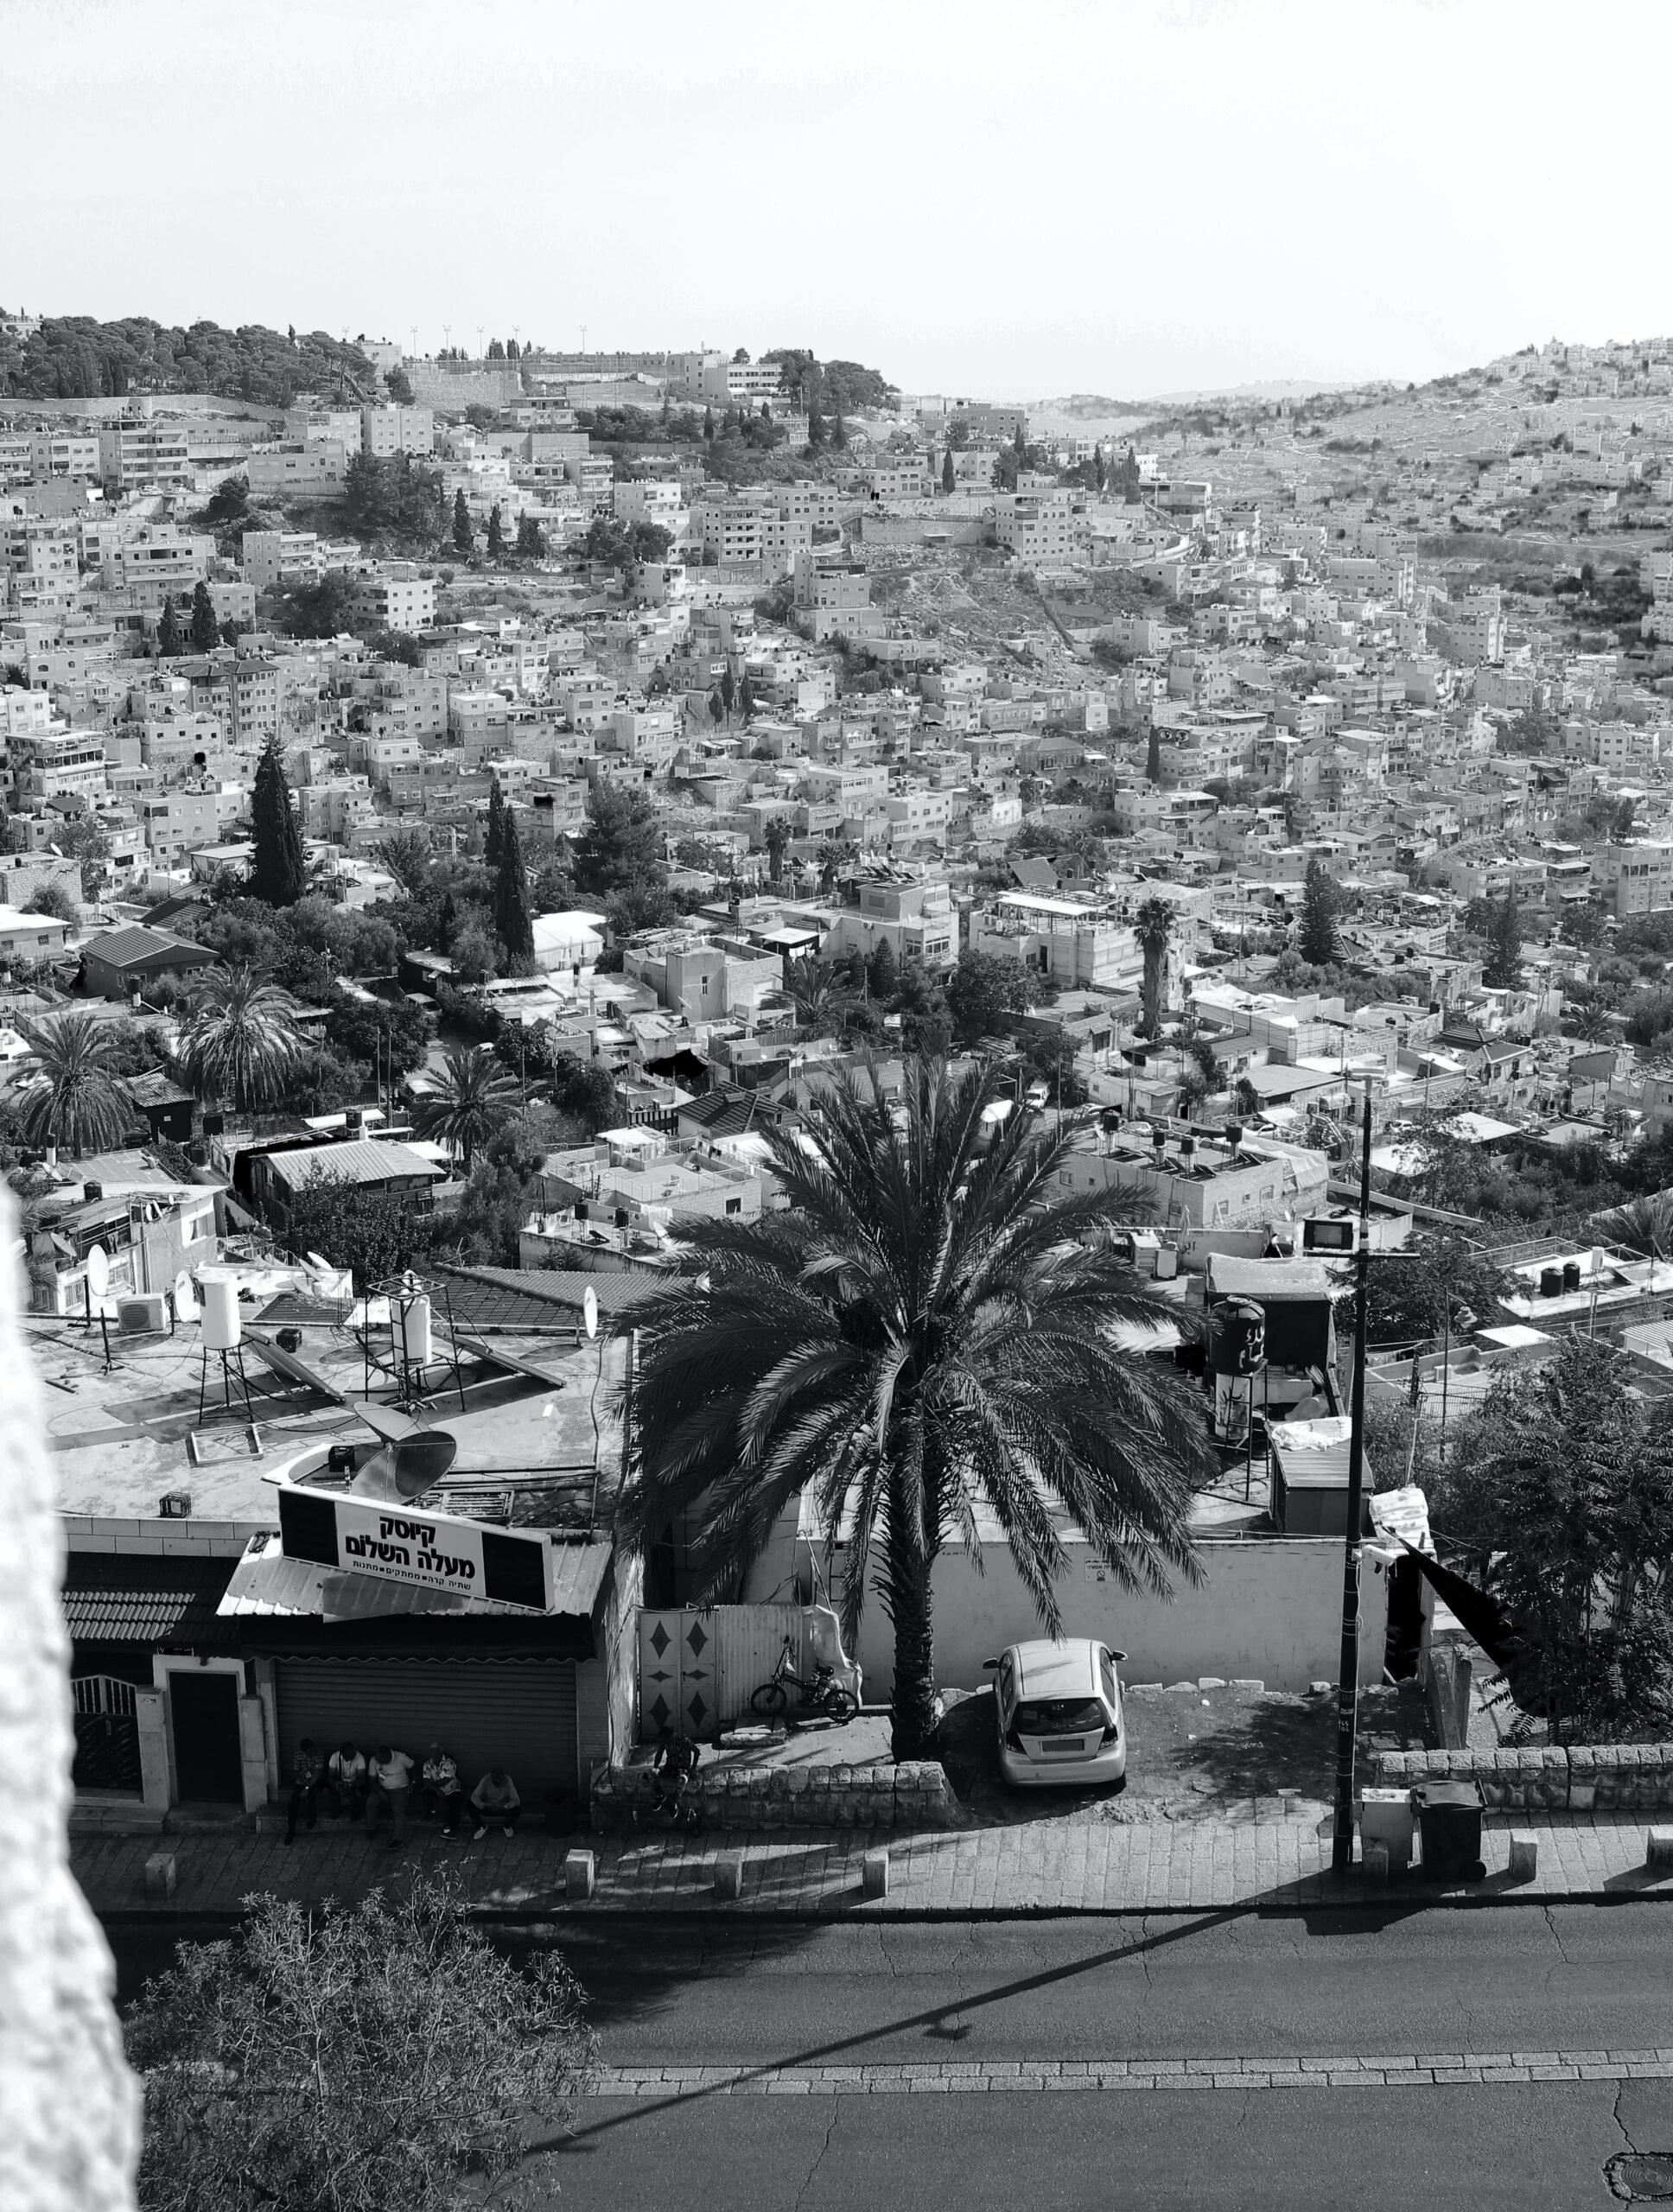 Gerusalemme, foto di Joshua Armstrong on Unsplash